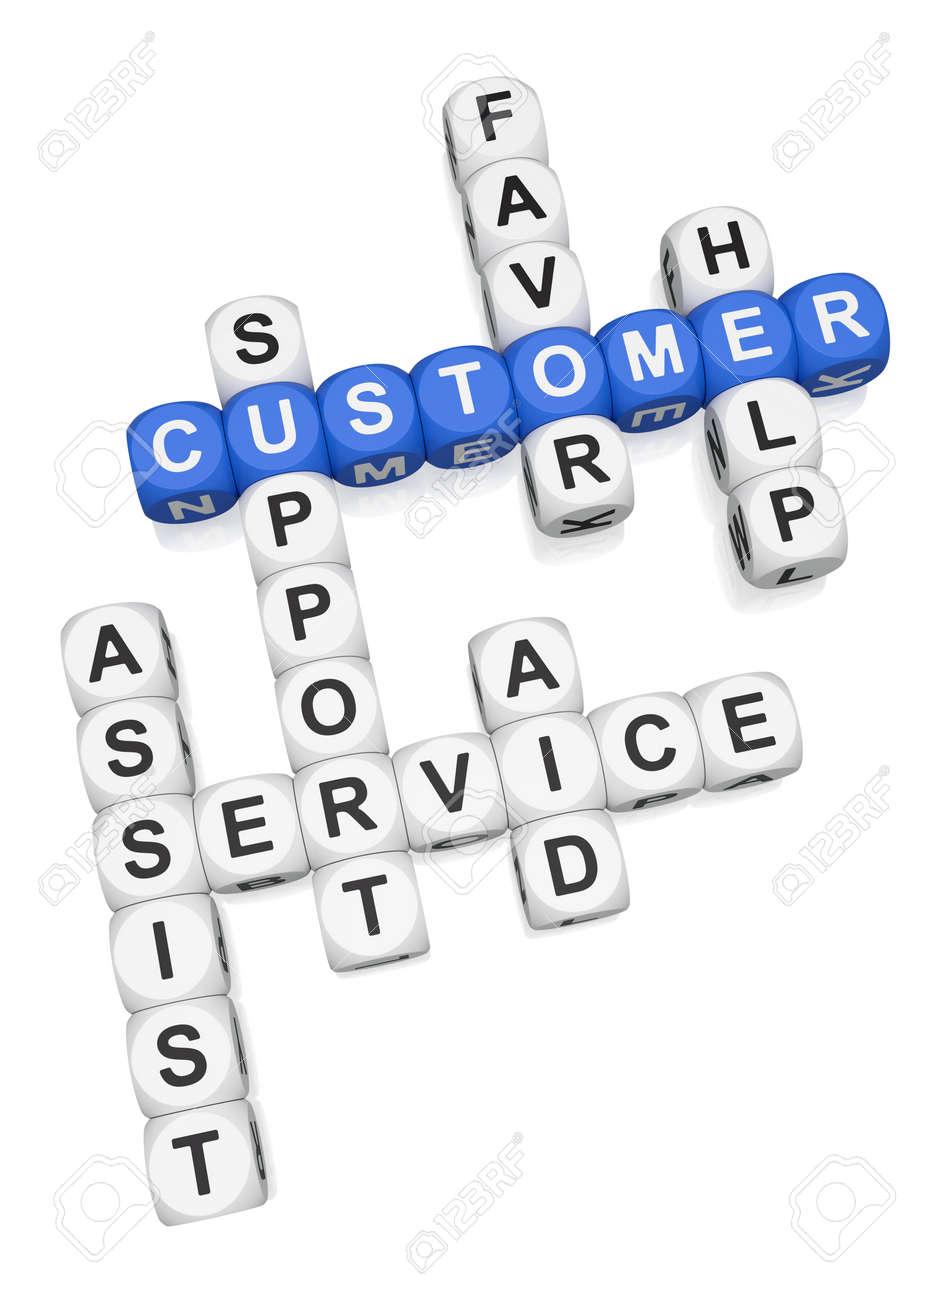 Customer assist crossword on white background 3d render Stock Photo - 9346715